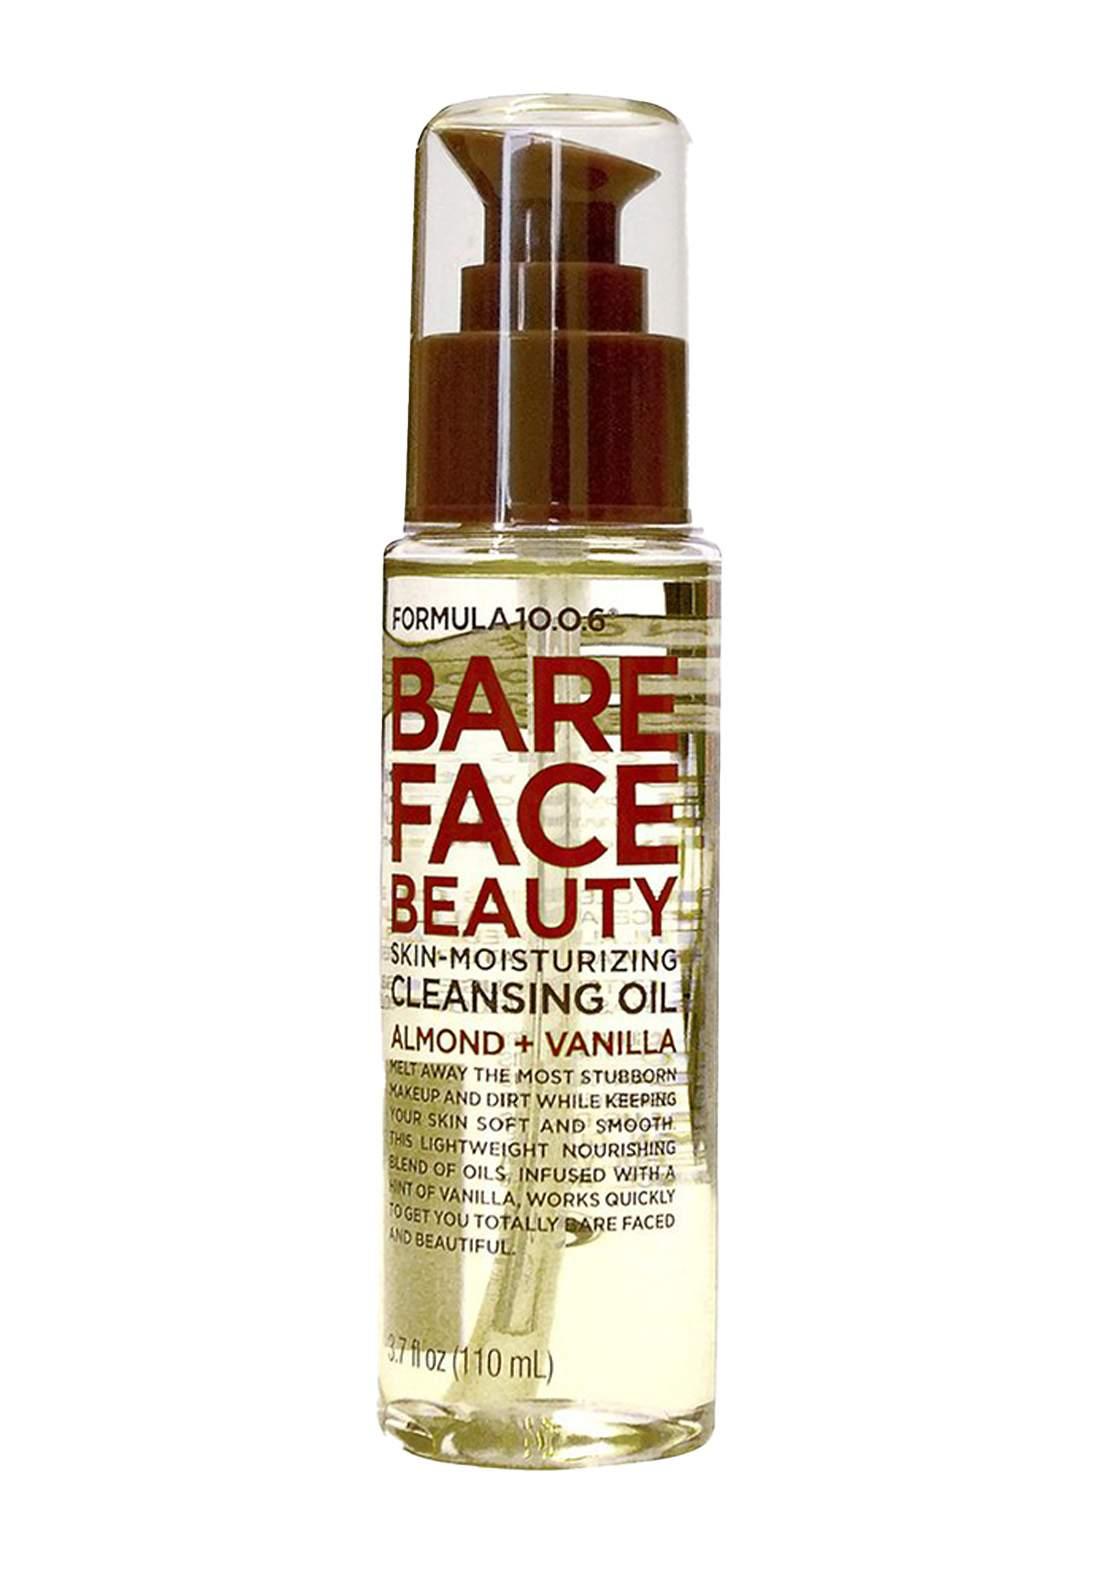 Formula Bare Face Beauty Skin-Moisturizing Cleansing Oil 110ml مزيل مكياج زيتي